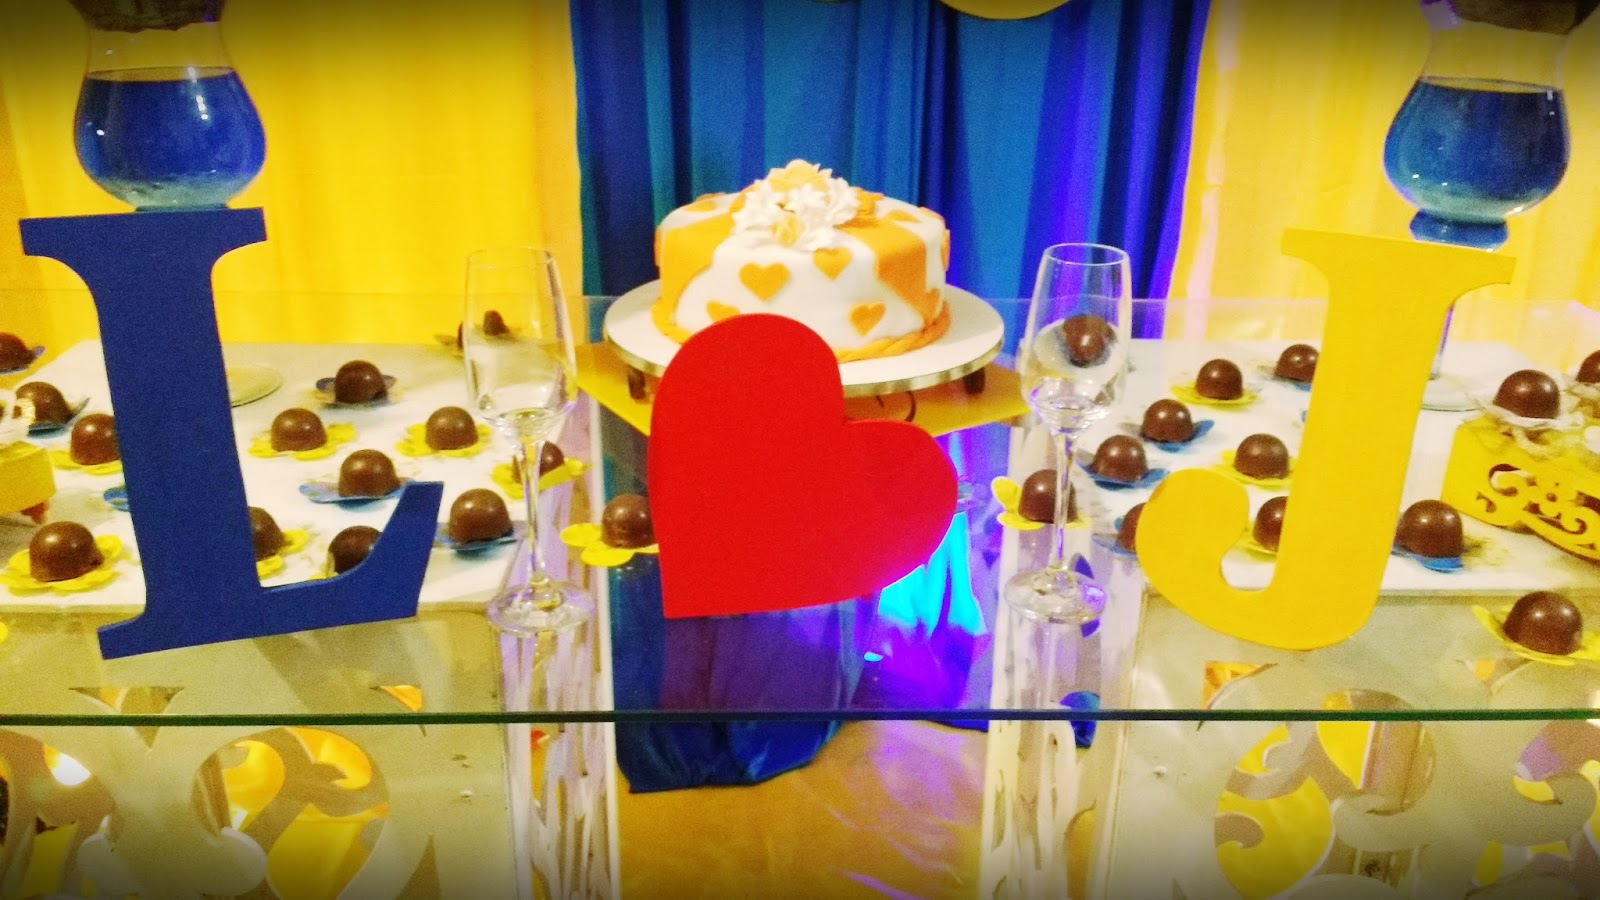 decoracao azul e amarelo noivado:Escritora de Merda: Festa de Noivado Azul e Amarelo